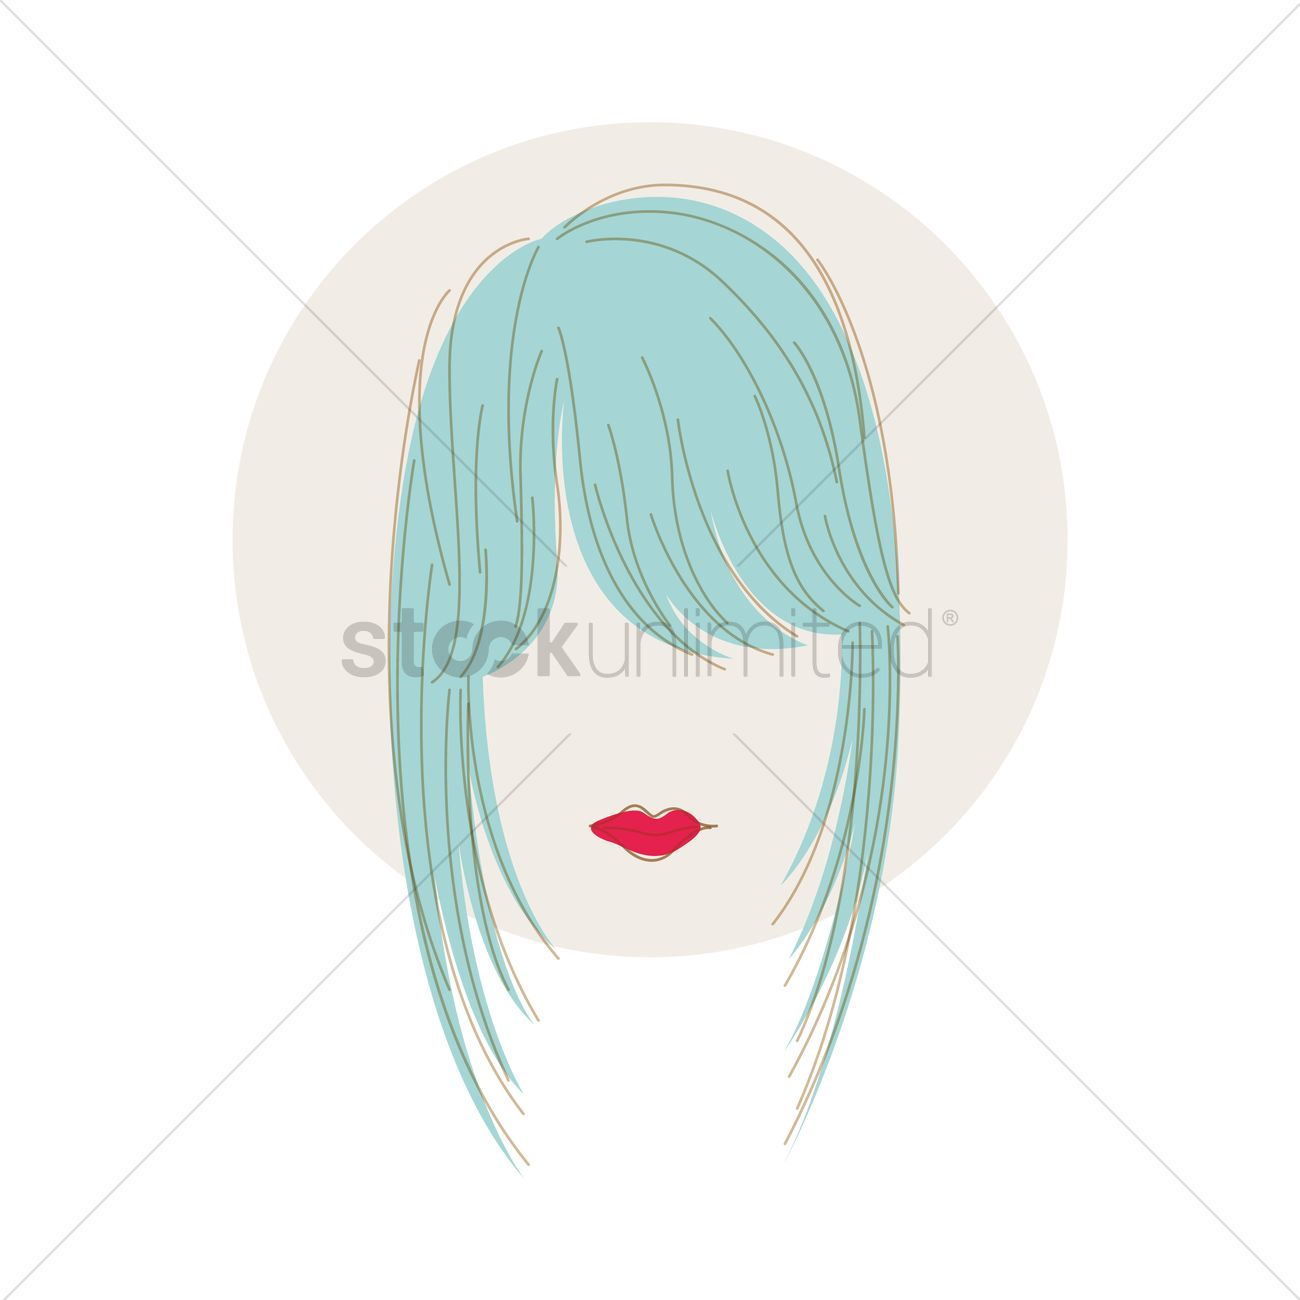 Fringe Hairstyle Vector Image 1373307 Stockunlimited